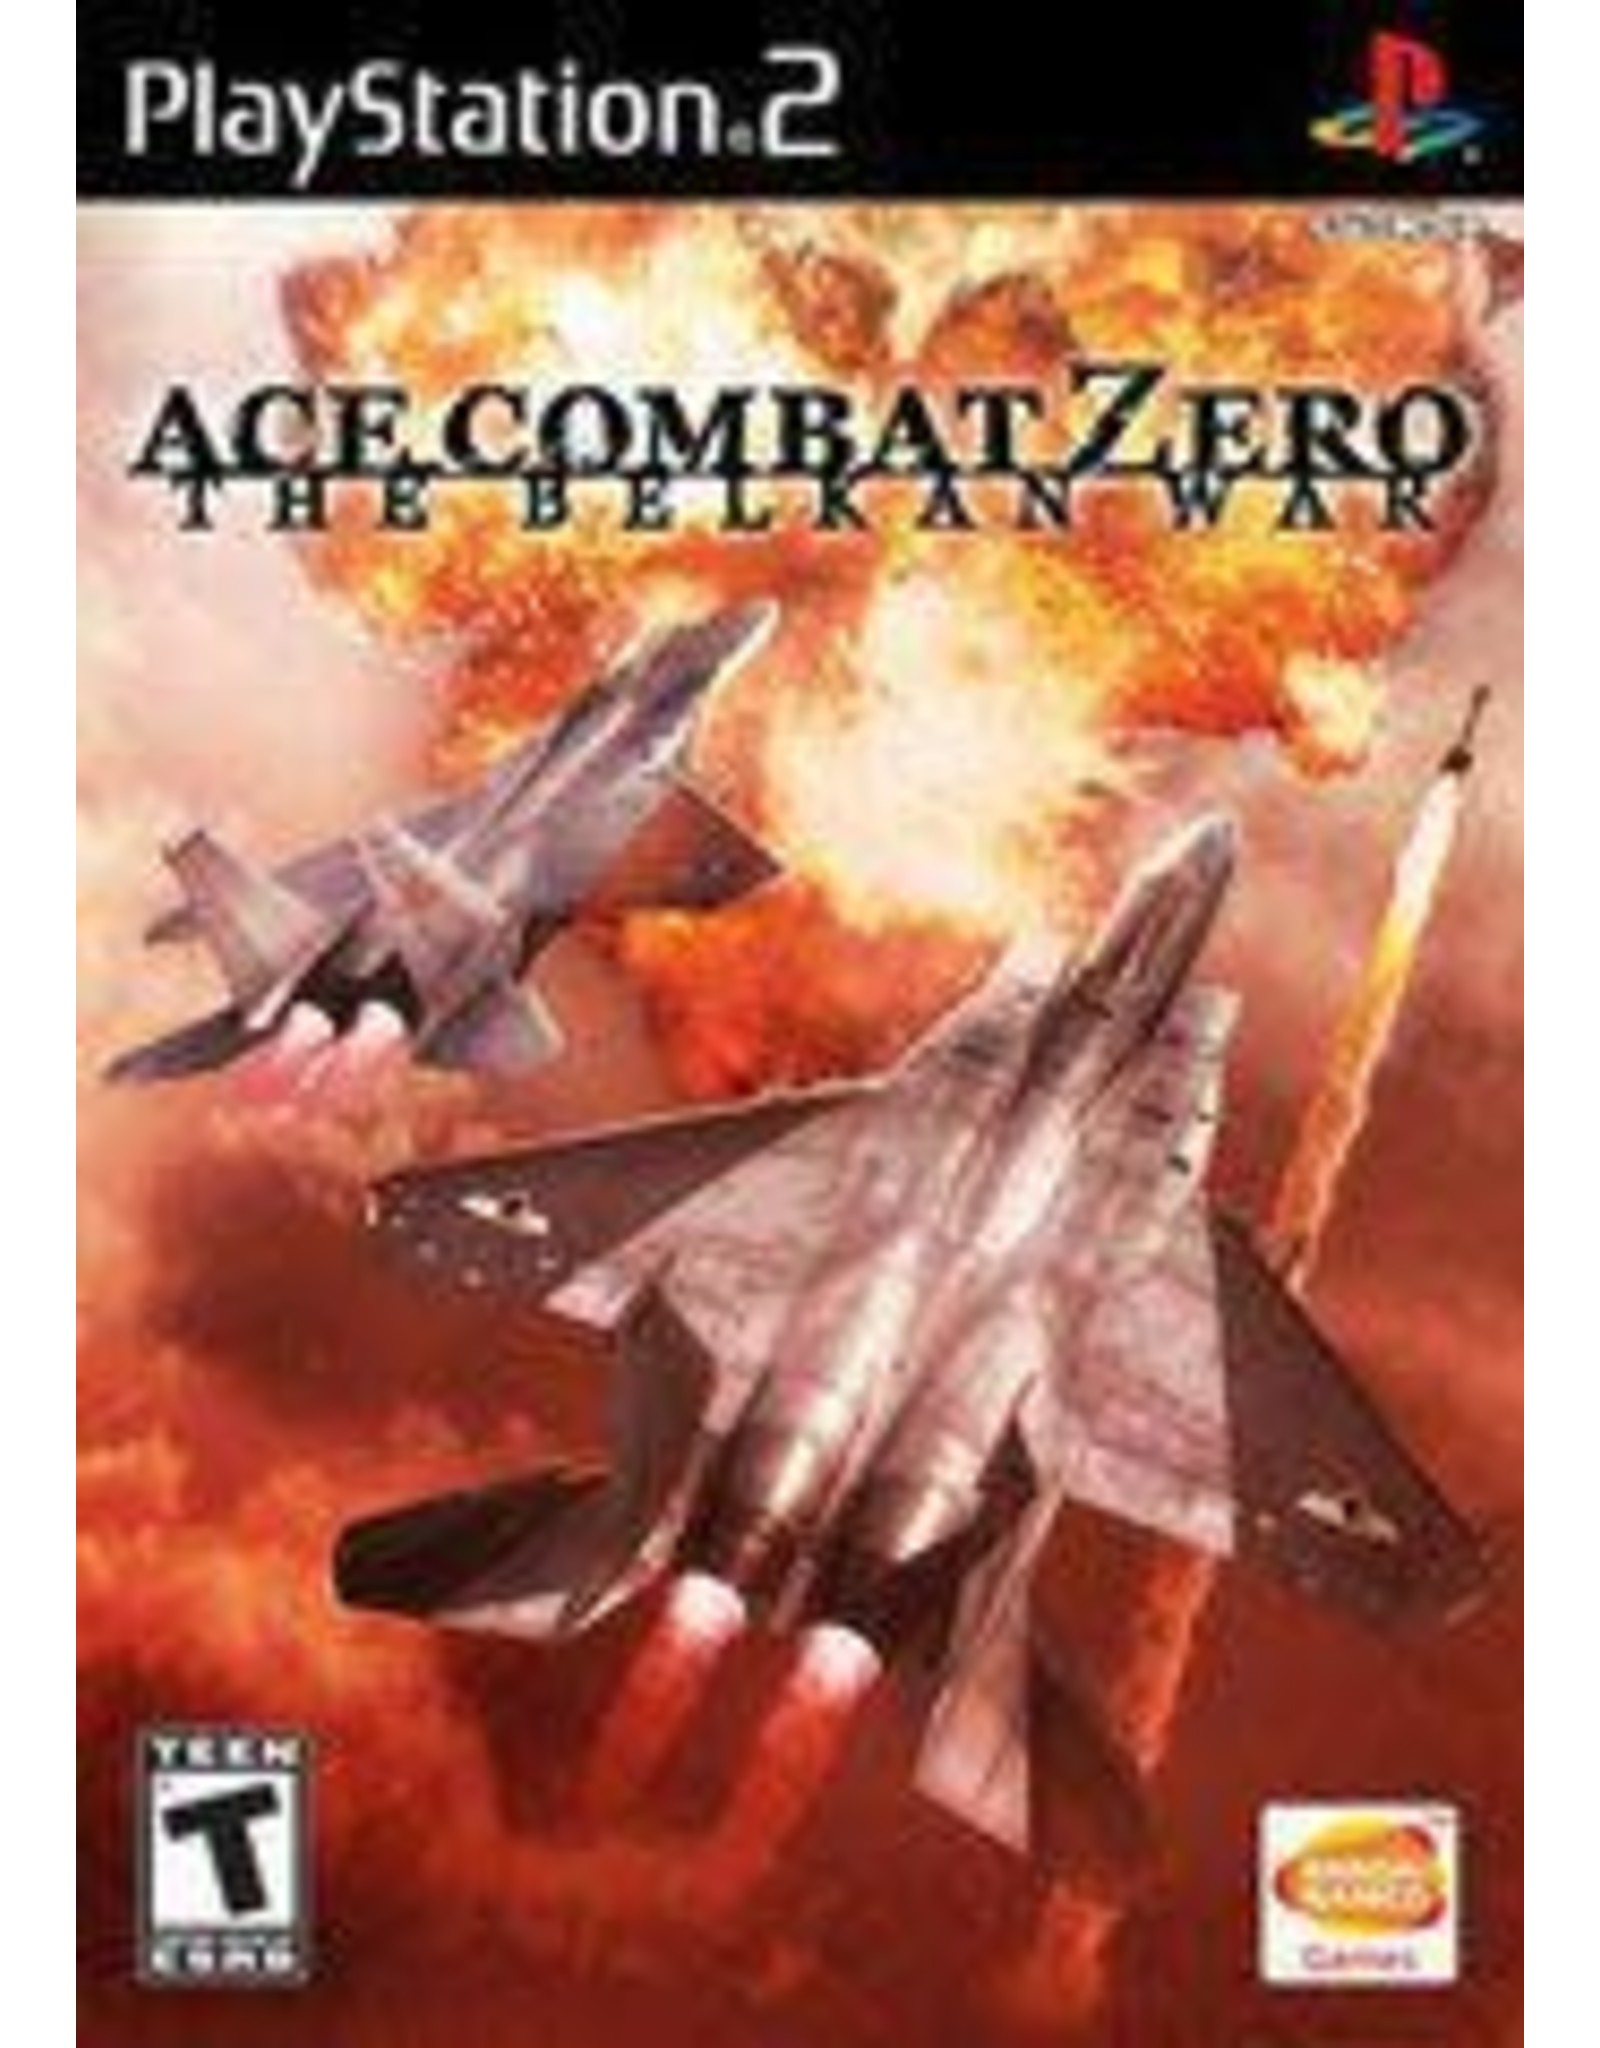 Playstation 2 Ace Combat Zero (CiB)